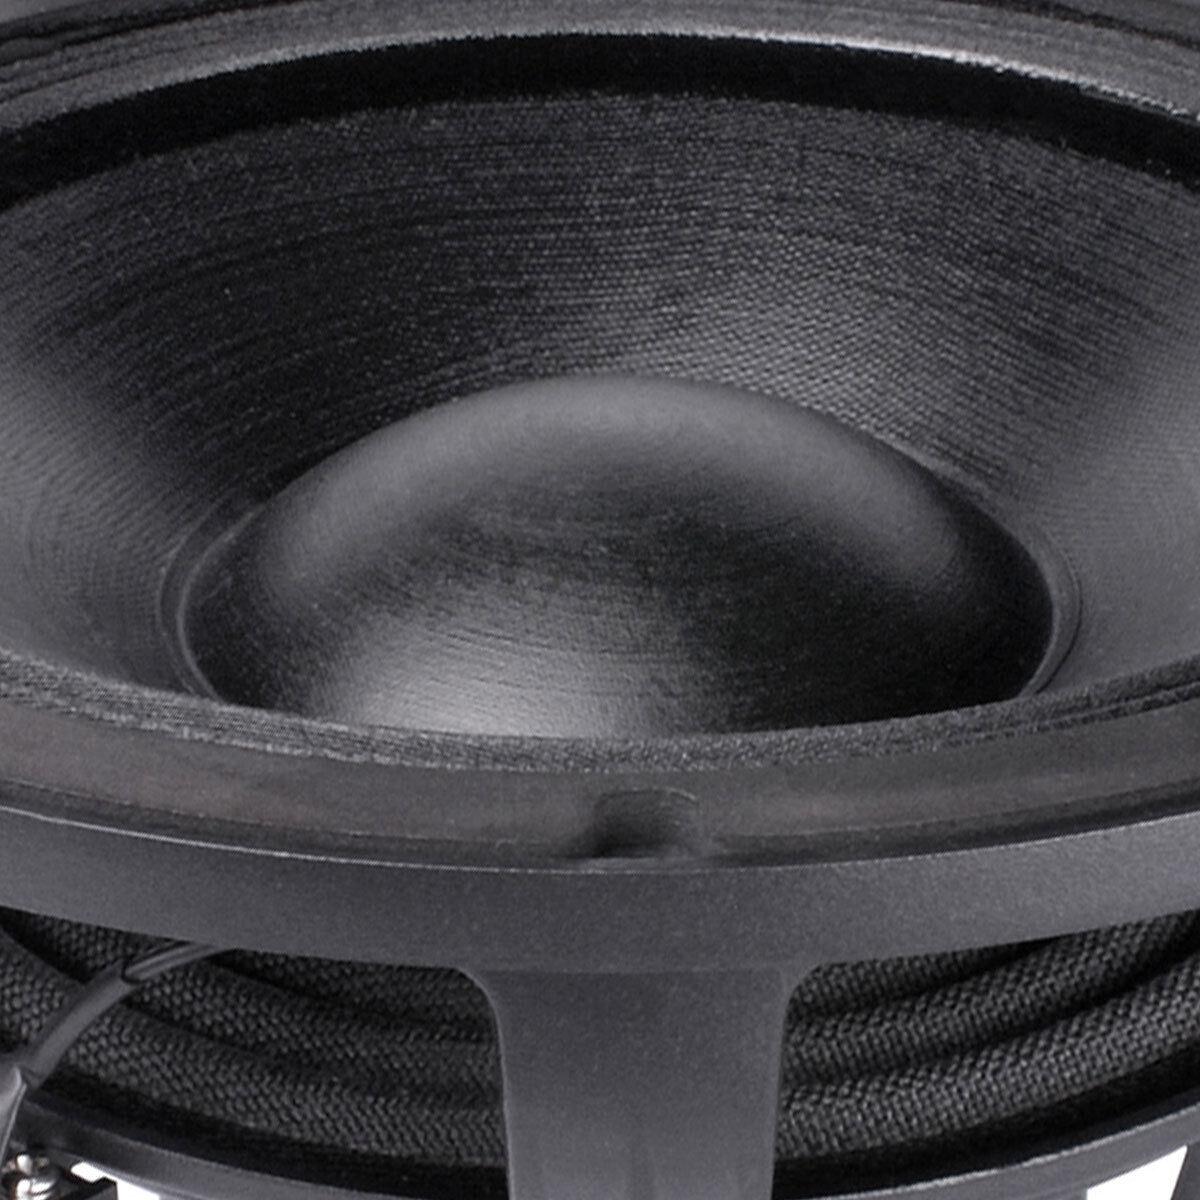 Faital PRO 10FH520 10  NEO Woofer Woofer Woofer Mid-Bass Midrange Speaker 8 ohm 1200W 97dB cc6eb9